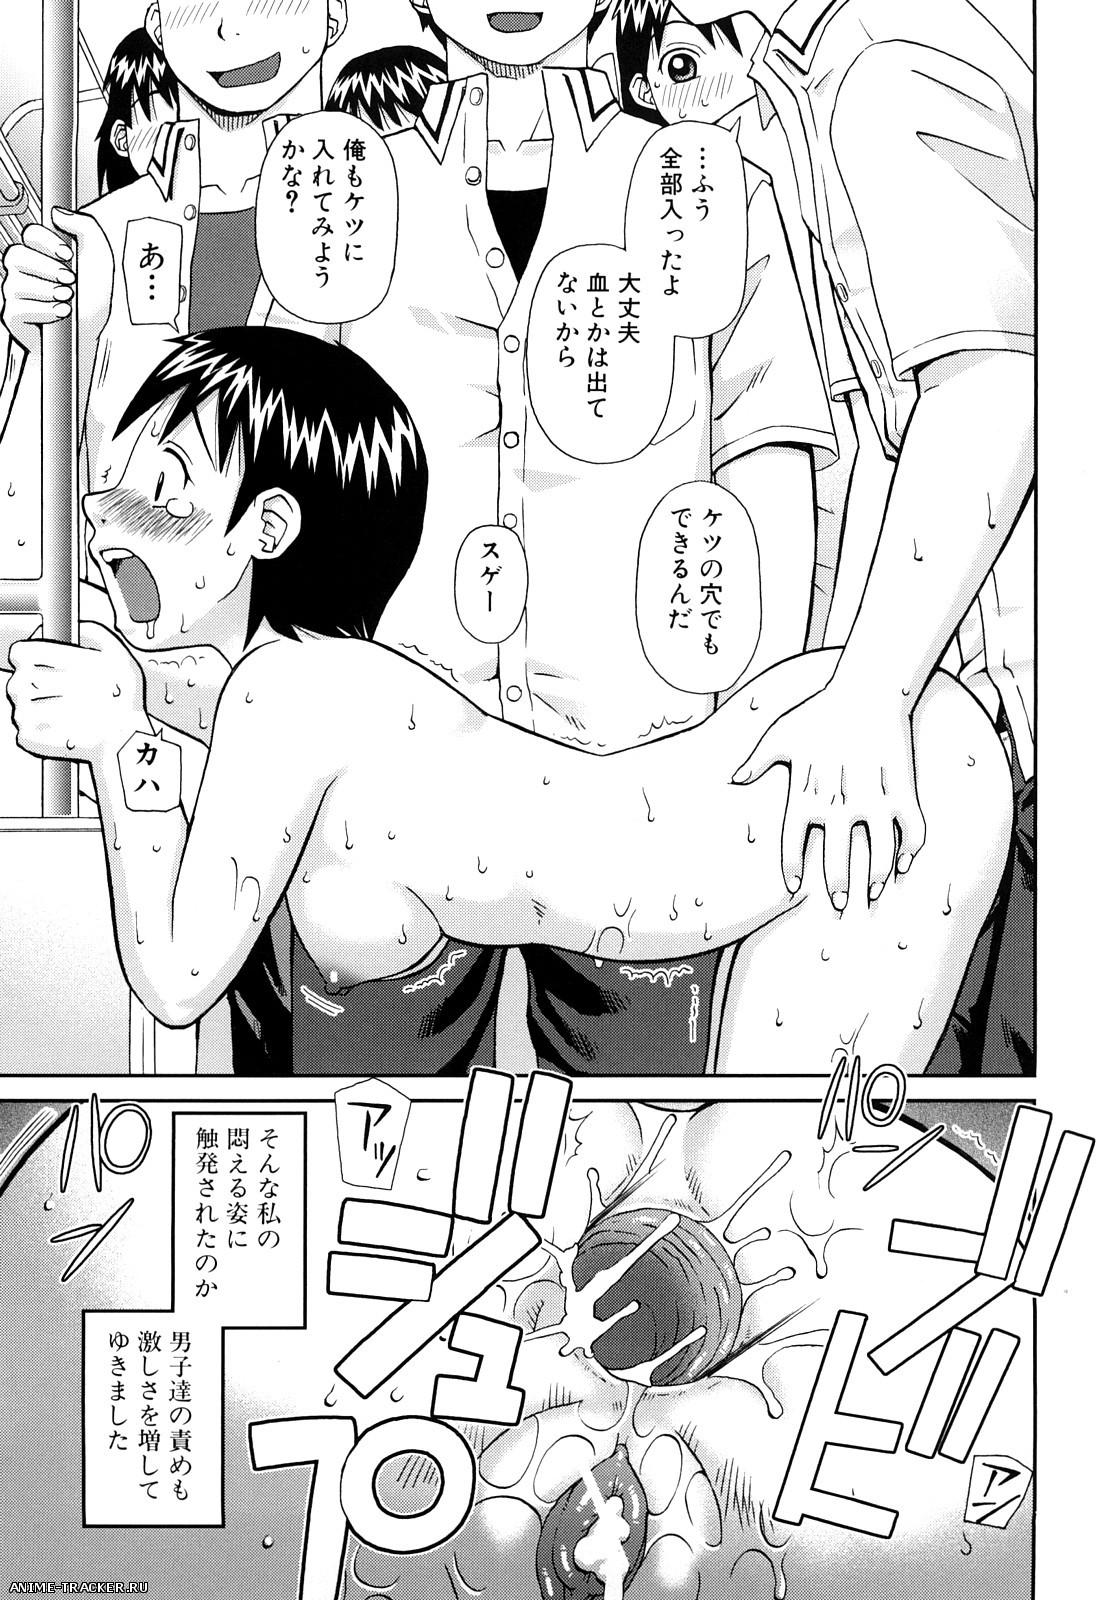 Kabashima Akira / Kiai Neko � ������� ������ ����� [Ptcen] [ENG,RUS,JAP] Manga Hentai